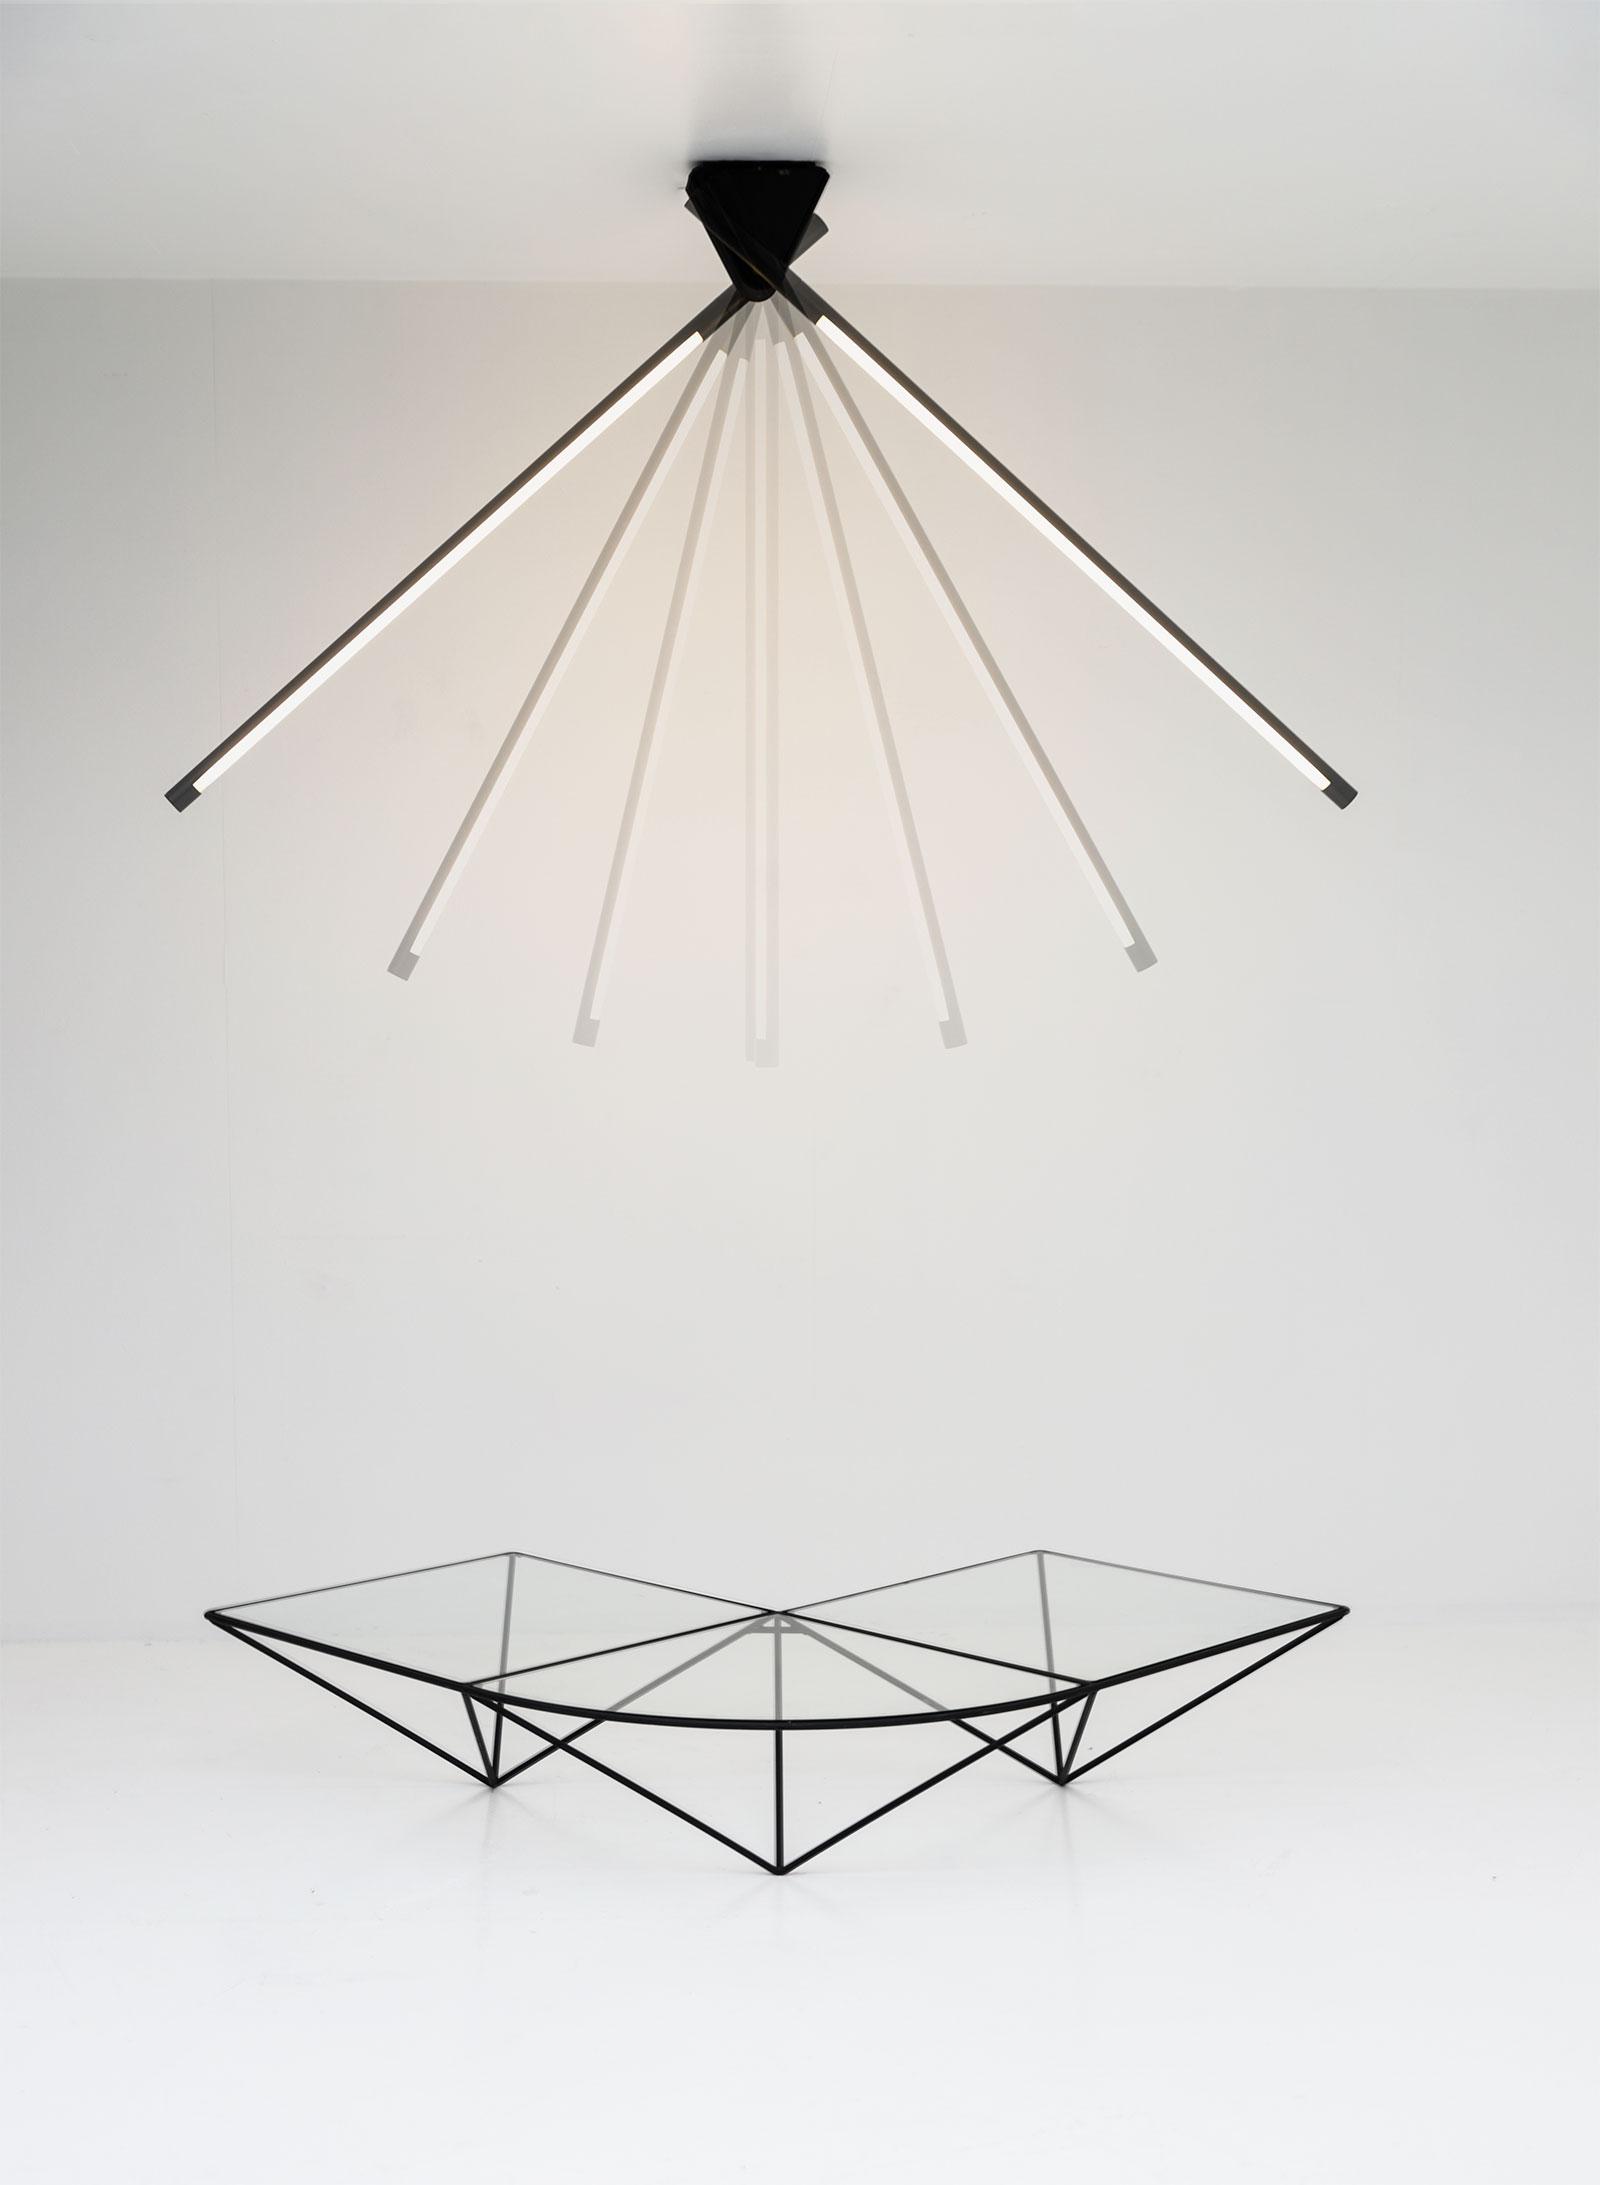 Rodolfo Bonetto Wall, Ceiling or Floor lampimage 14